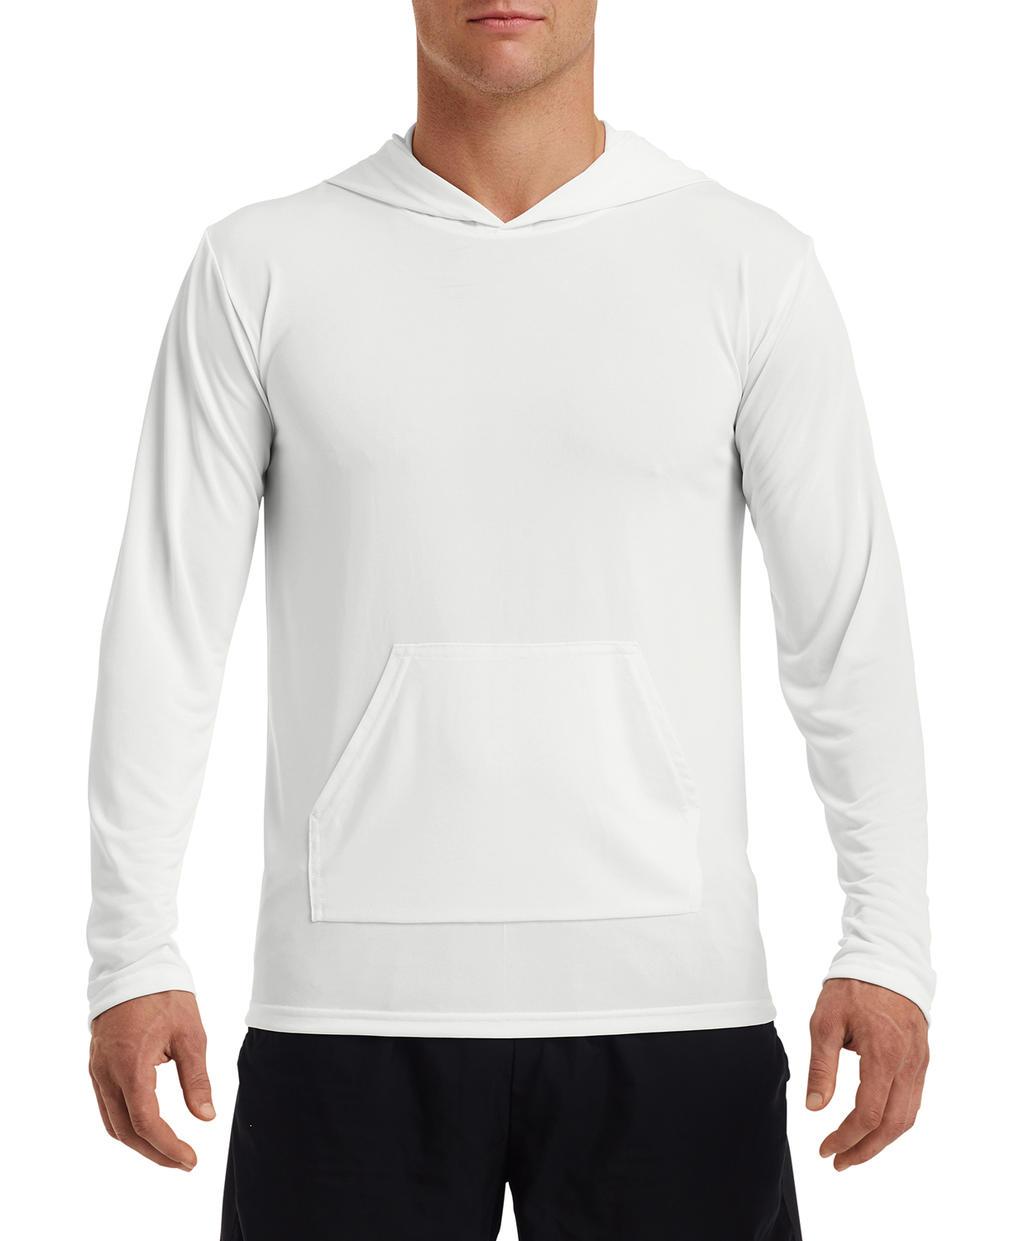 b1b46082a4 Pánske tričko s kapucňou Performance®